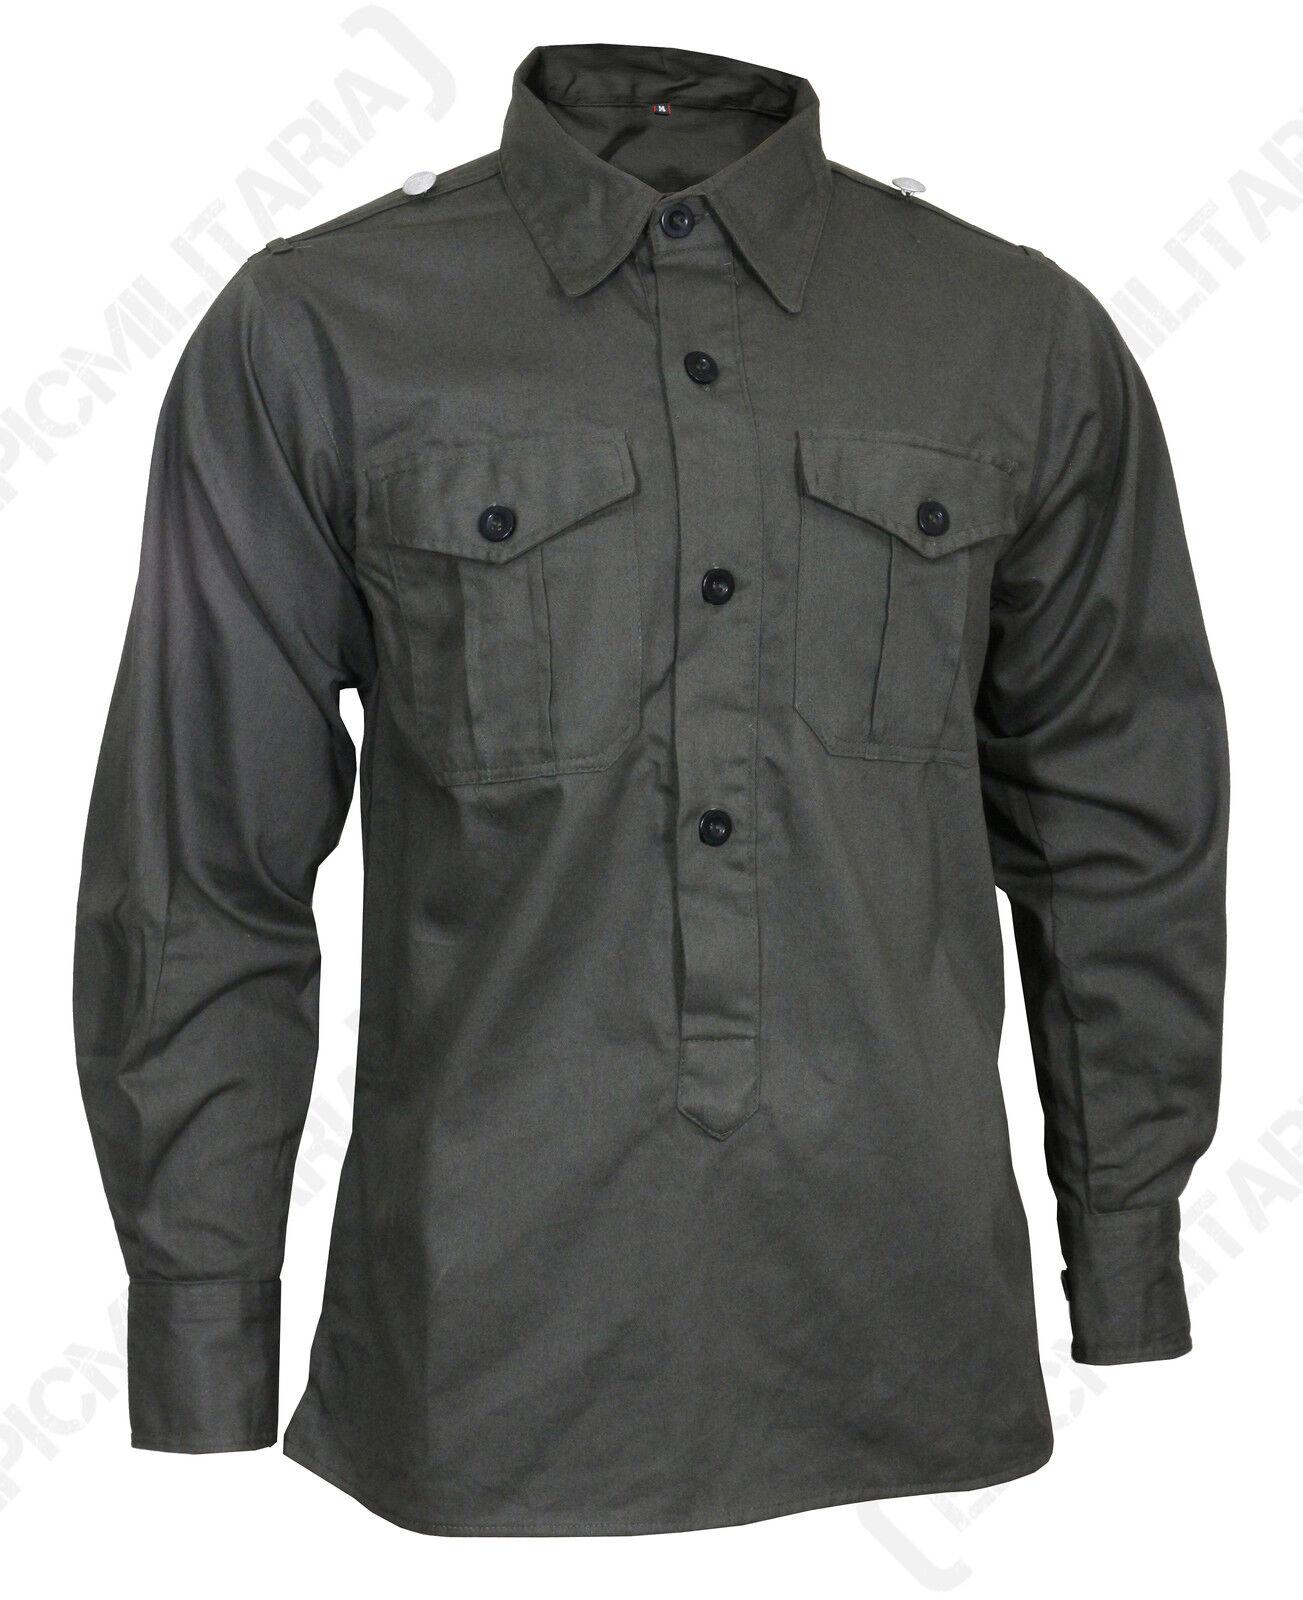 German Army MILITARY Field SHIRT Hemden - All Sizes Field Grey Cotton WW2 Repro